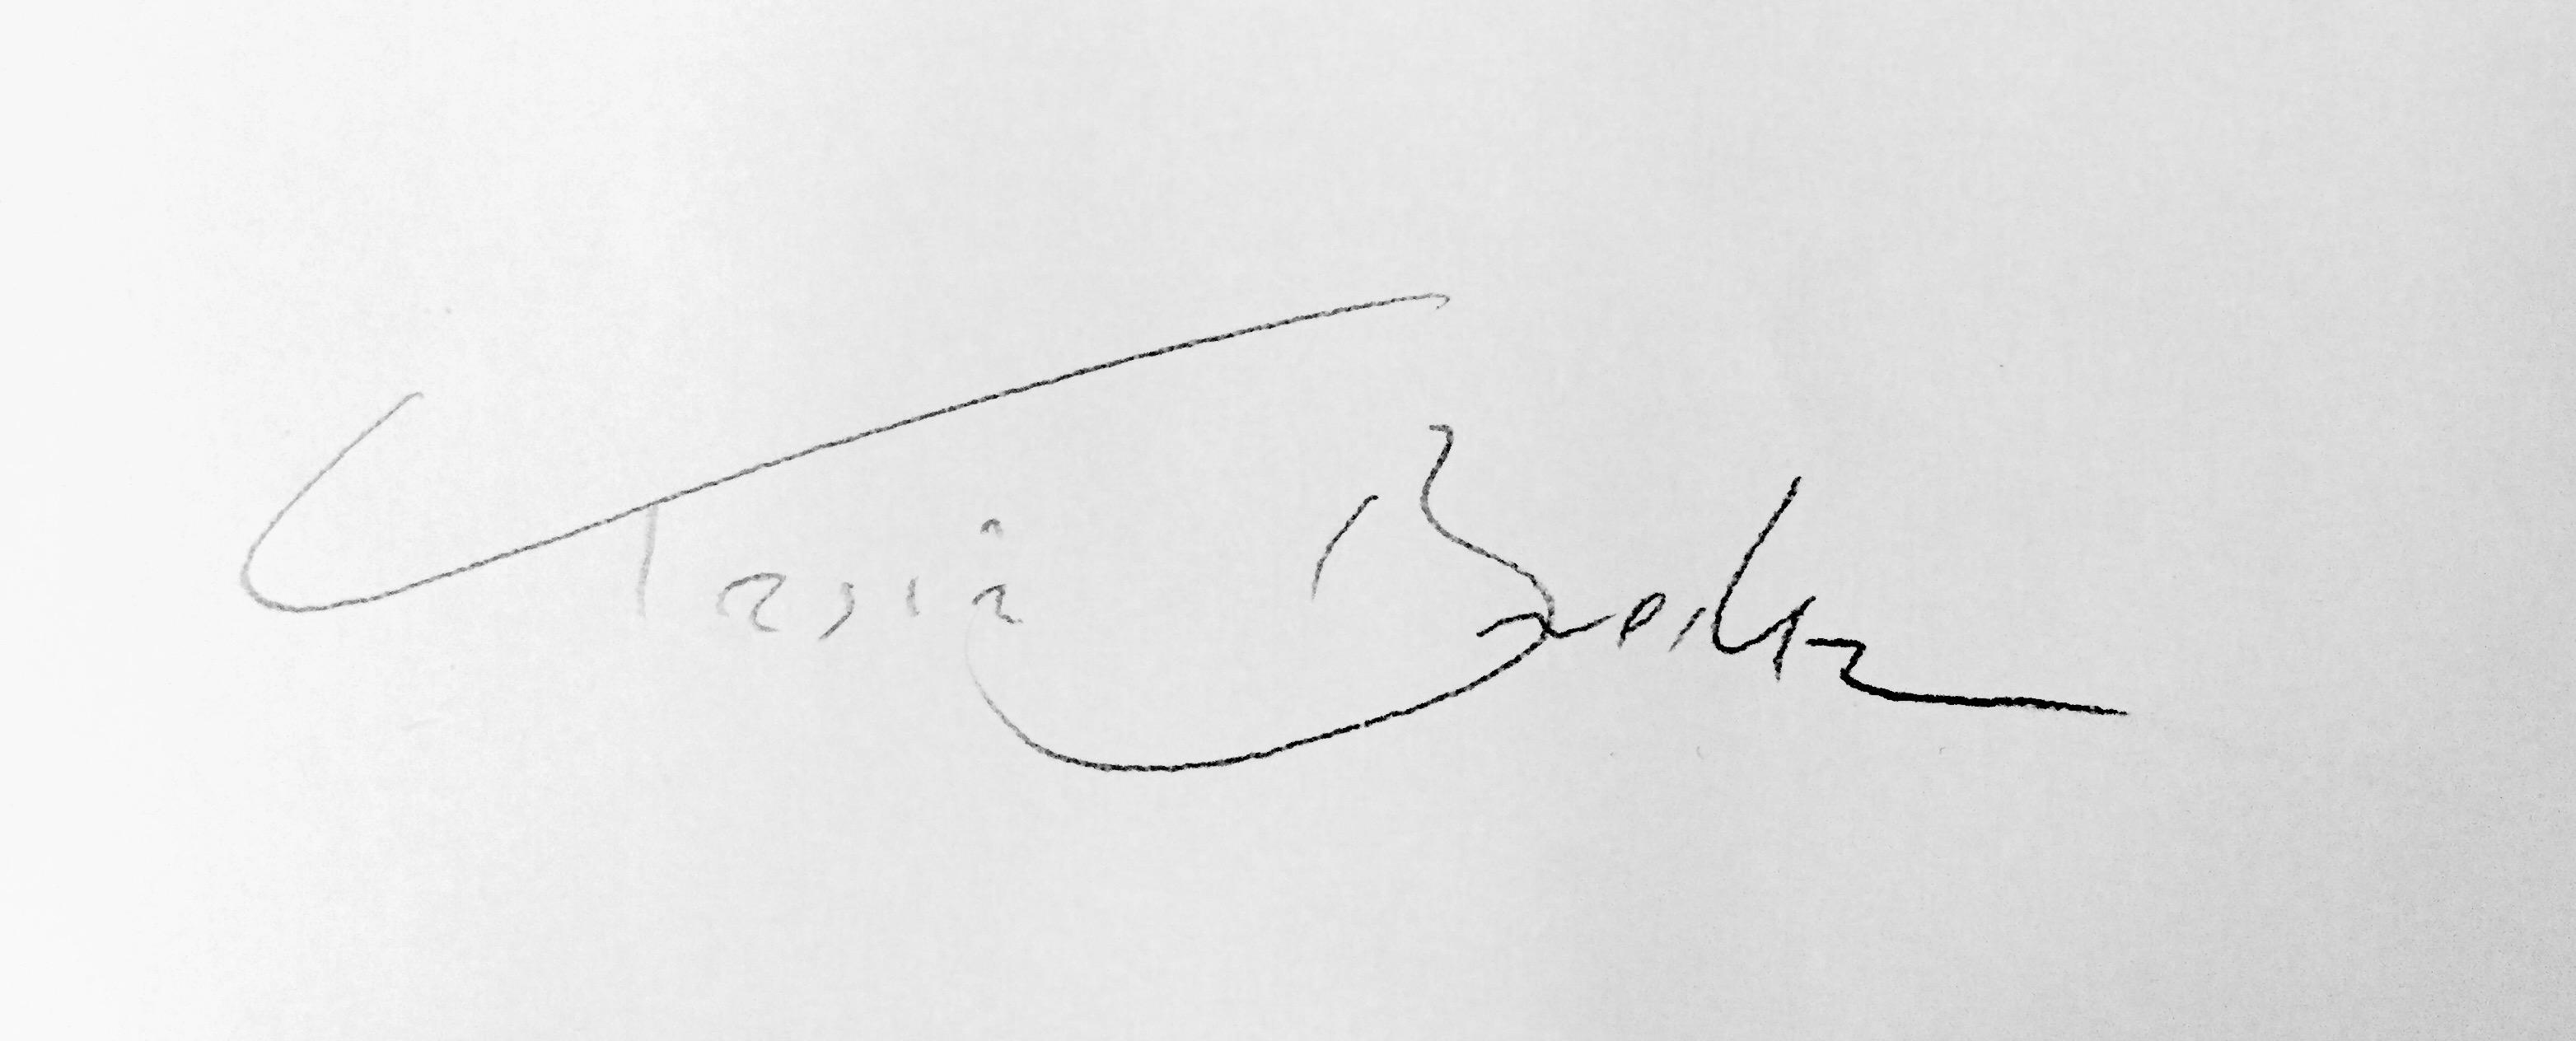 Kasia Breska's Signature